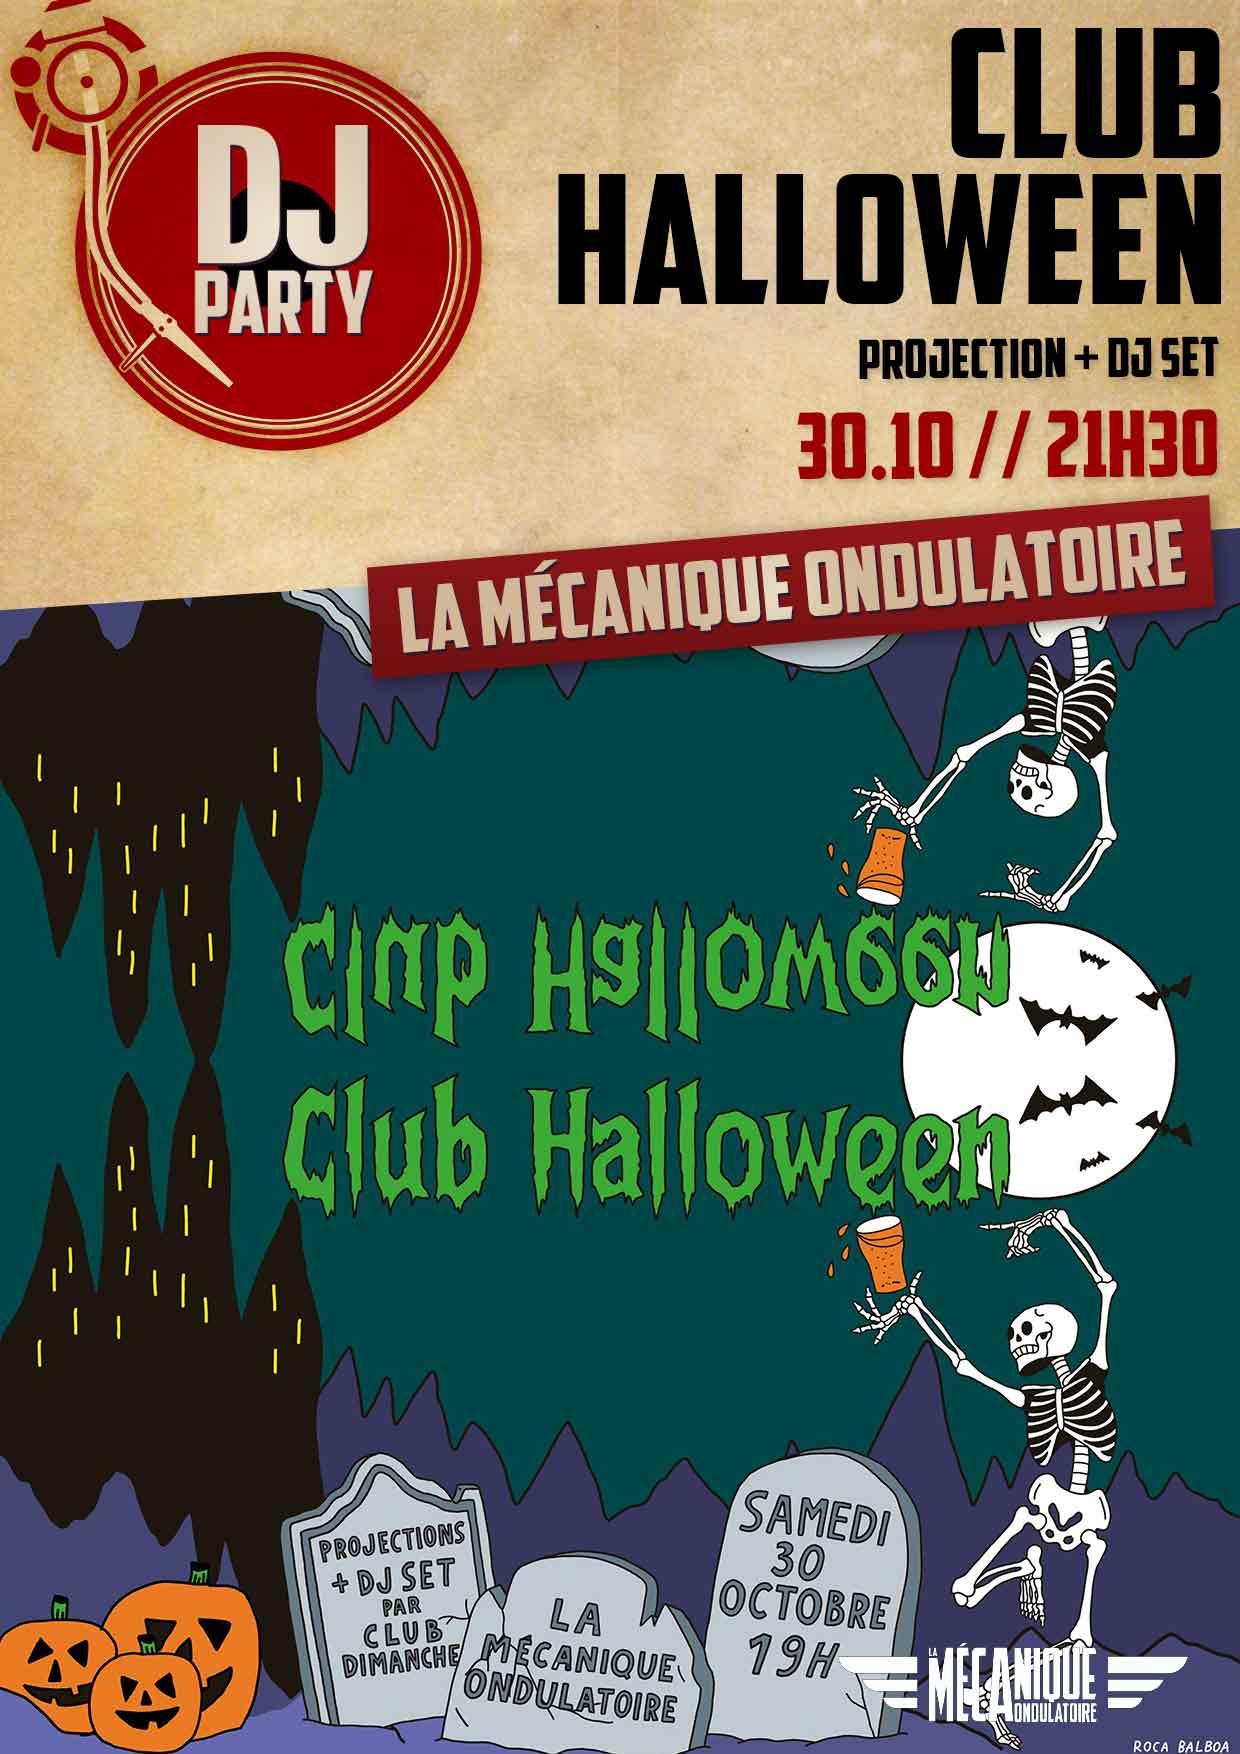 CLUB HALLOWEEN // 30.10